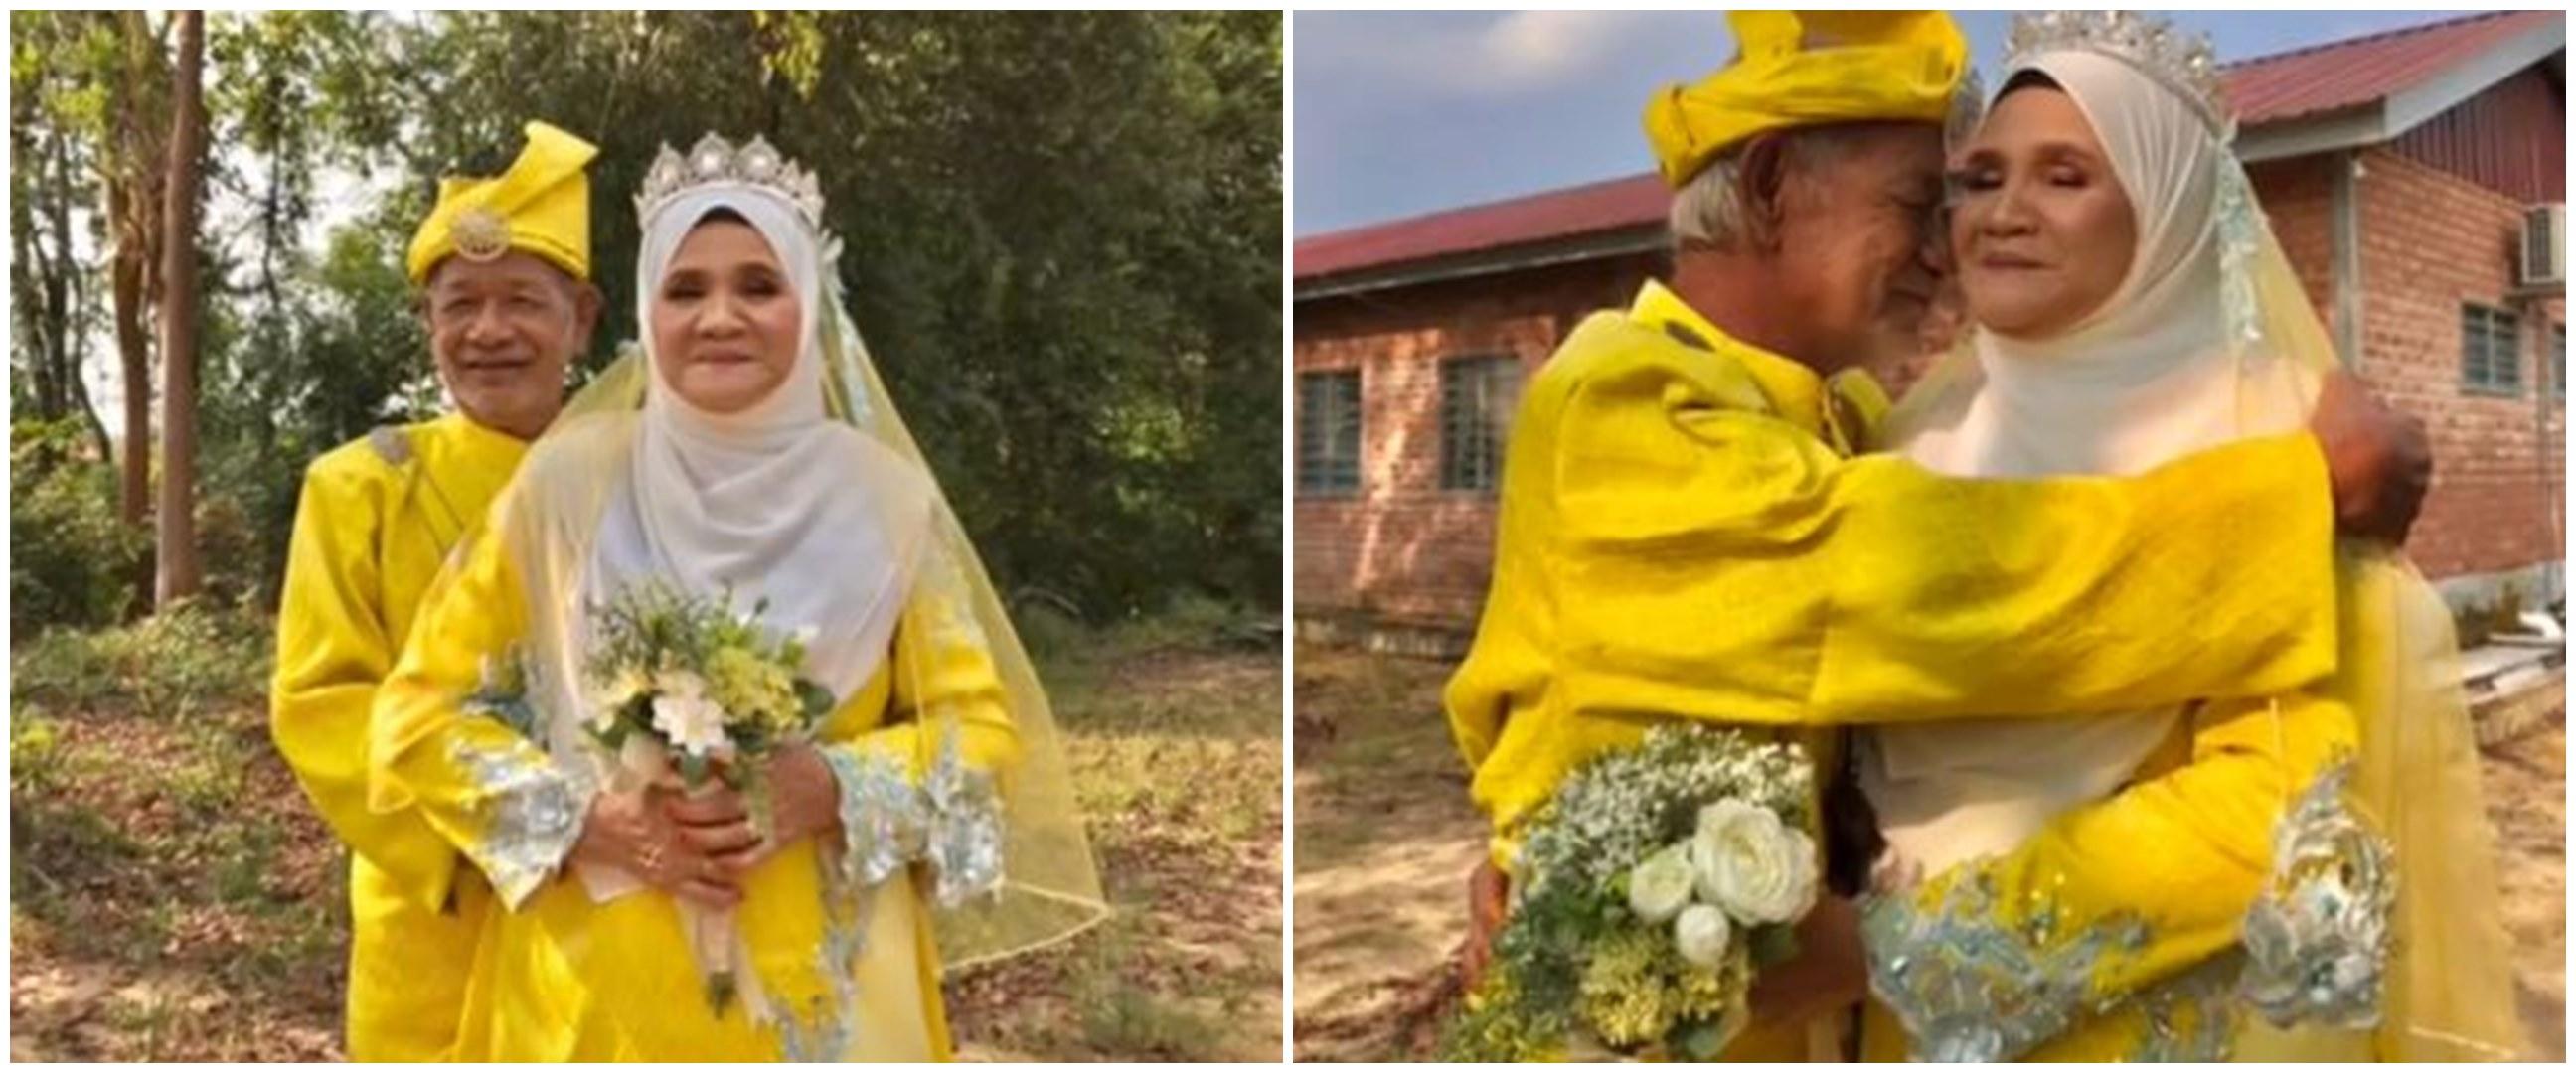 Rayakan anniversary ke-53, pasangan ini dandan pakai baju pengantin